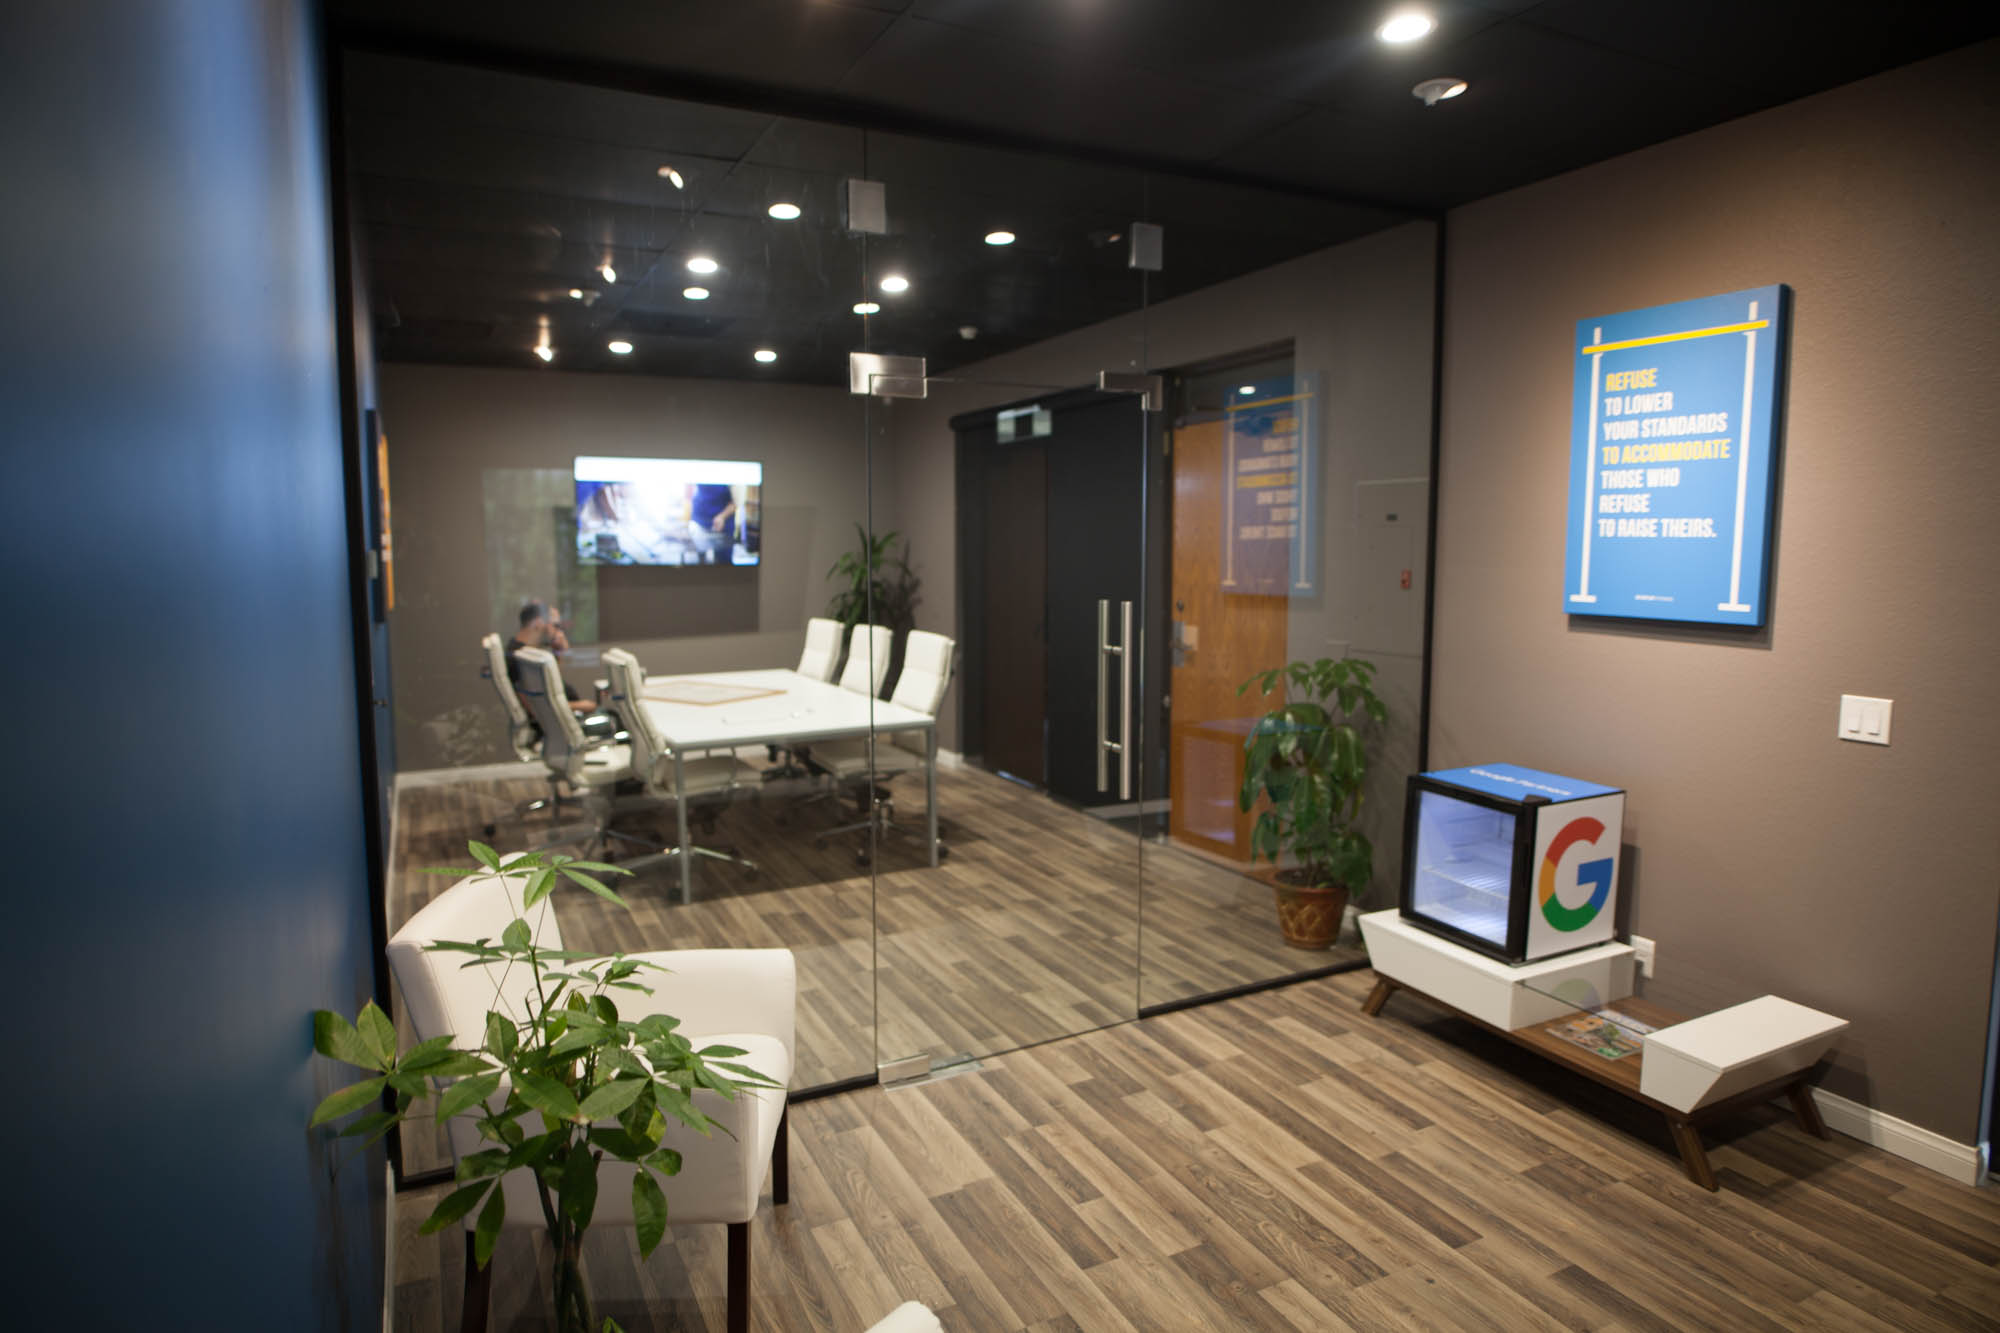 Lemonade Stand: Digital Marketing Agency   SEO, PPC